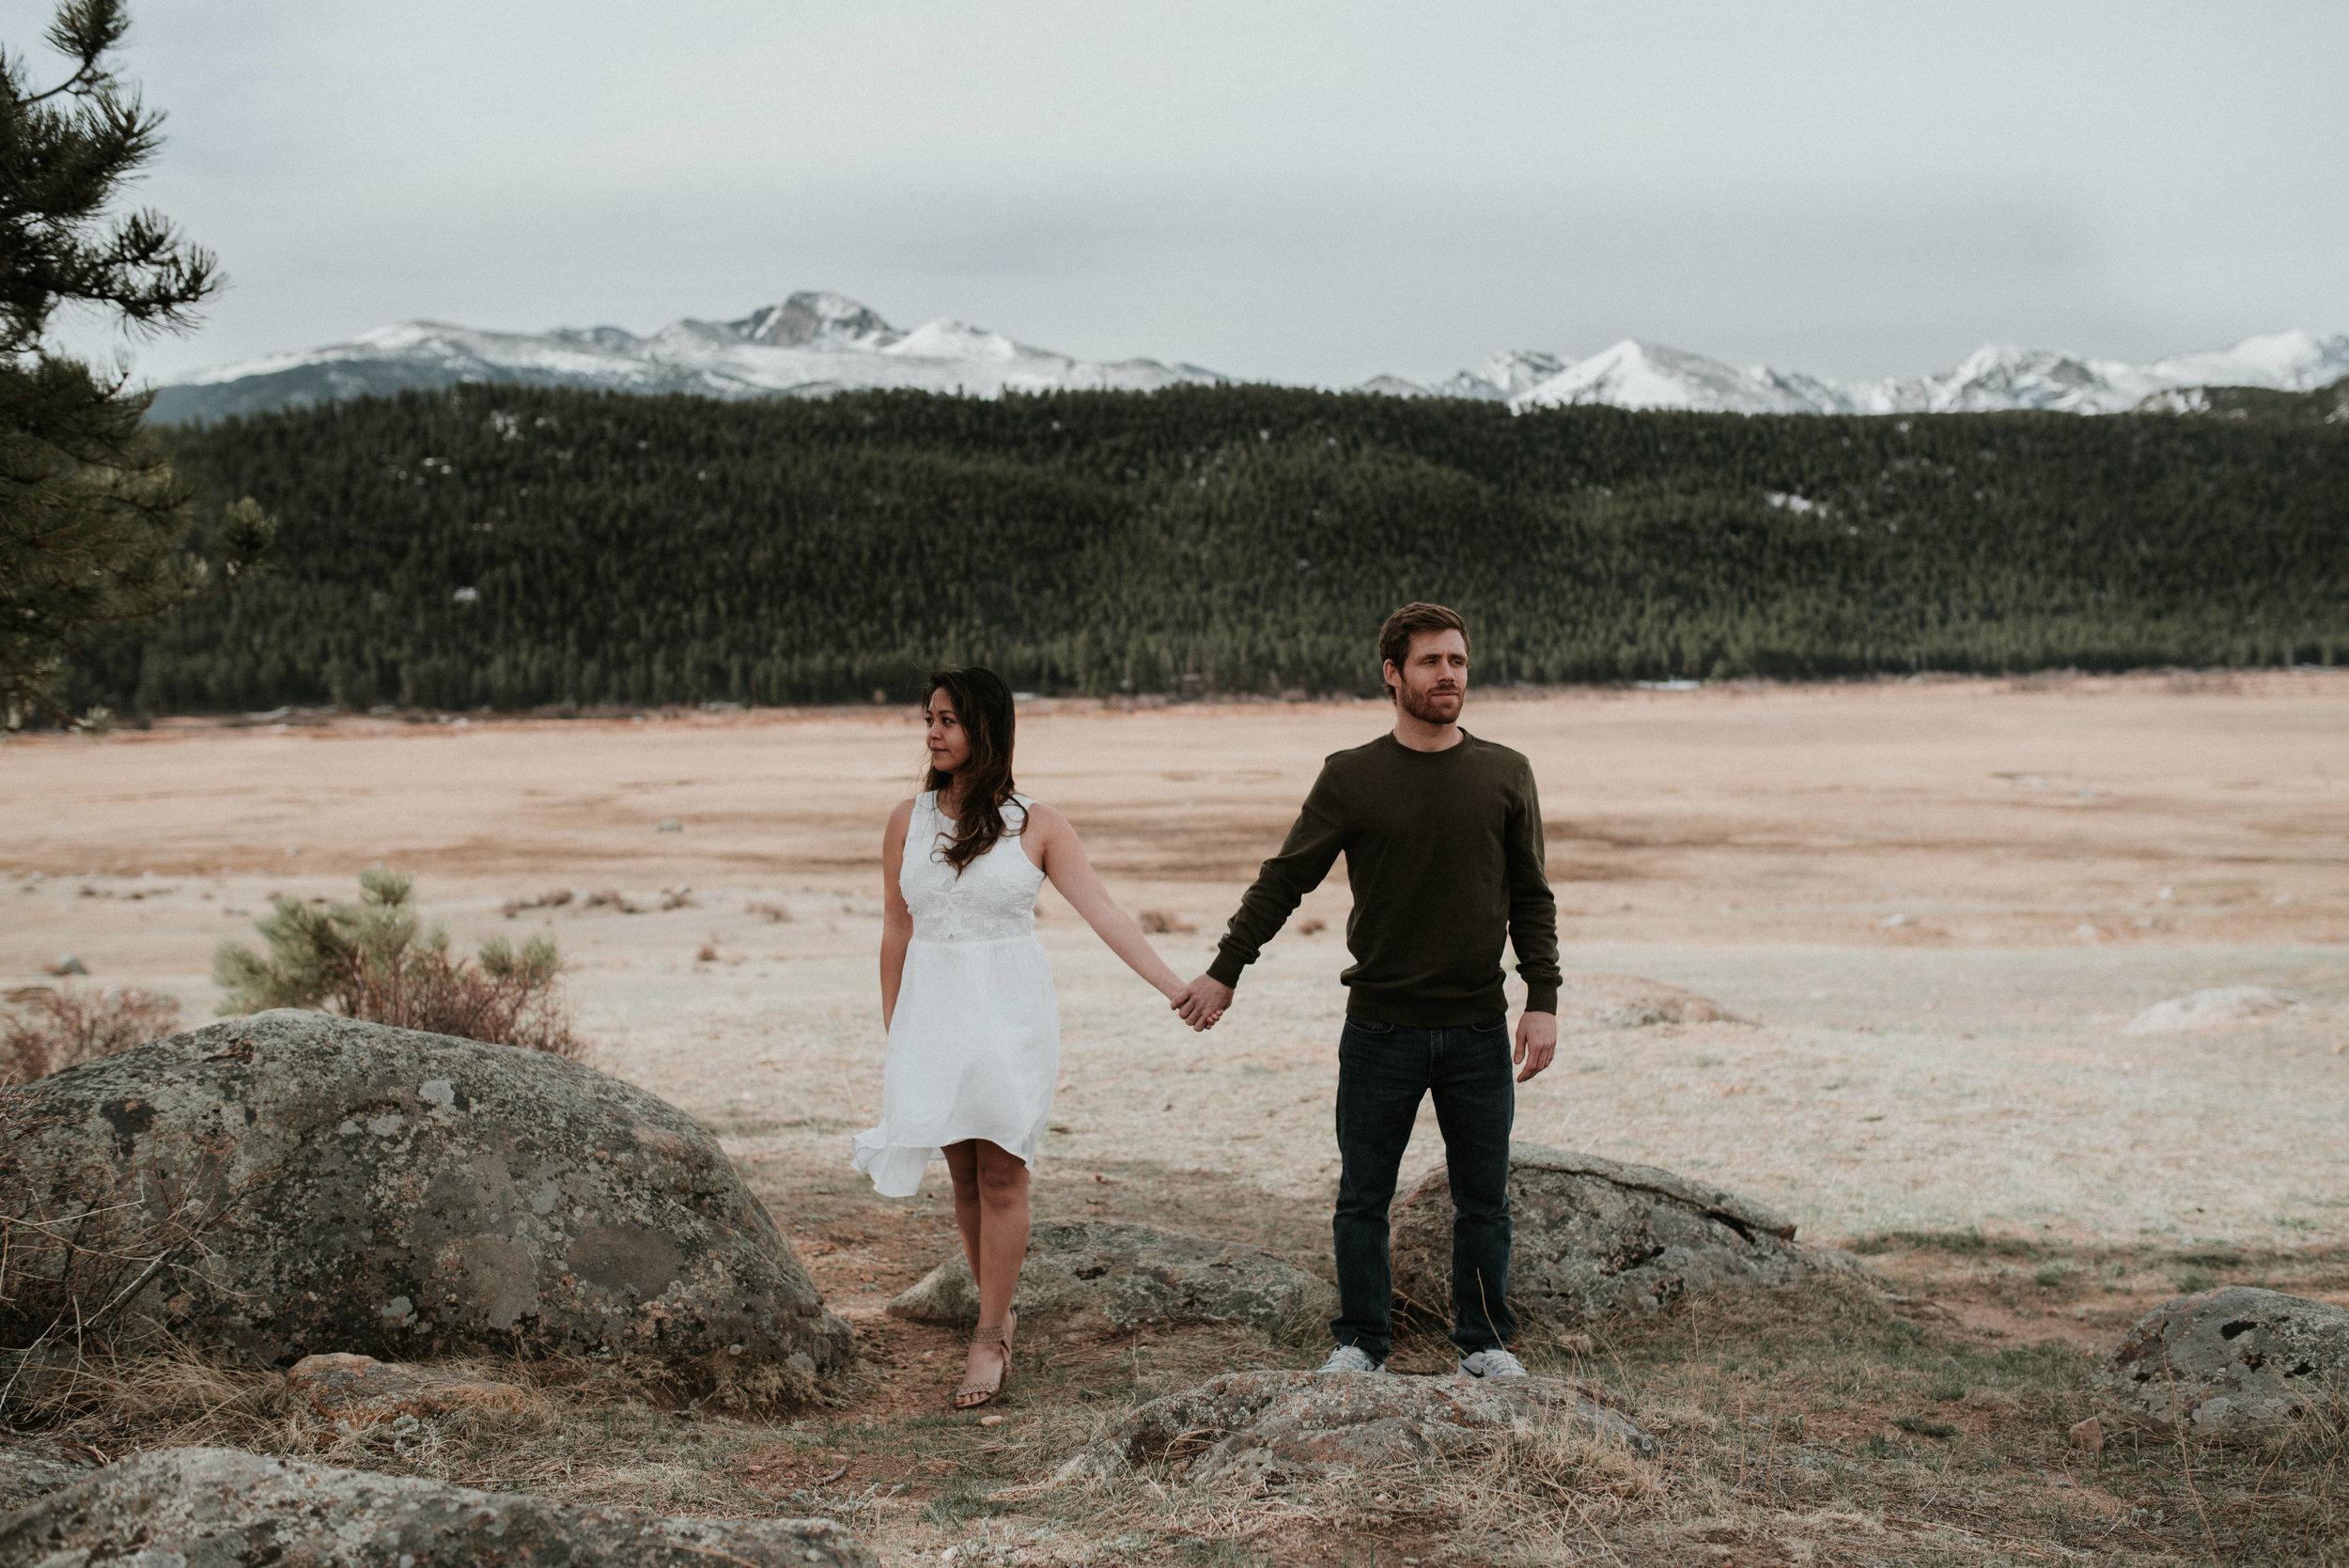 Zach&Rosalie Rocky Mountain National Park Engagement Denver Colorado Rocky Mountain Wedding Photographer00016.jpg